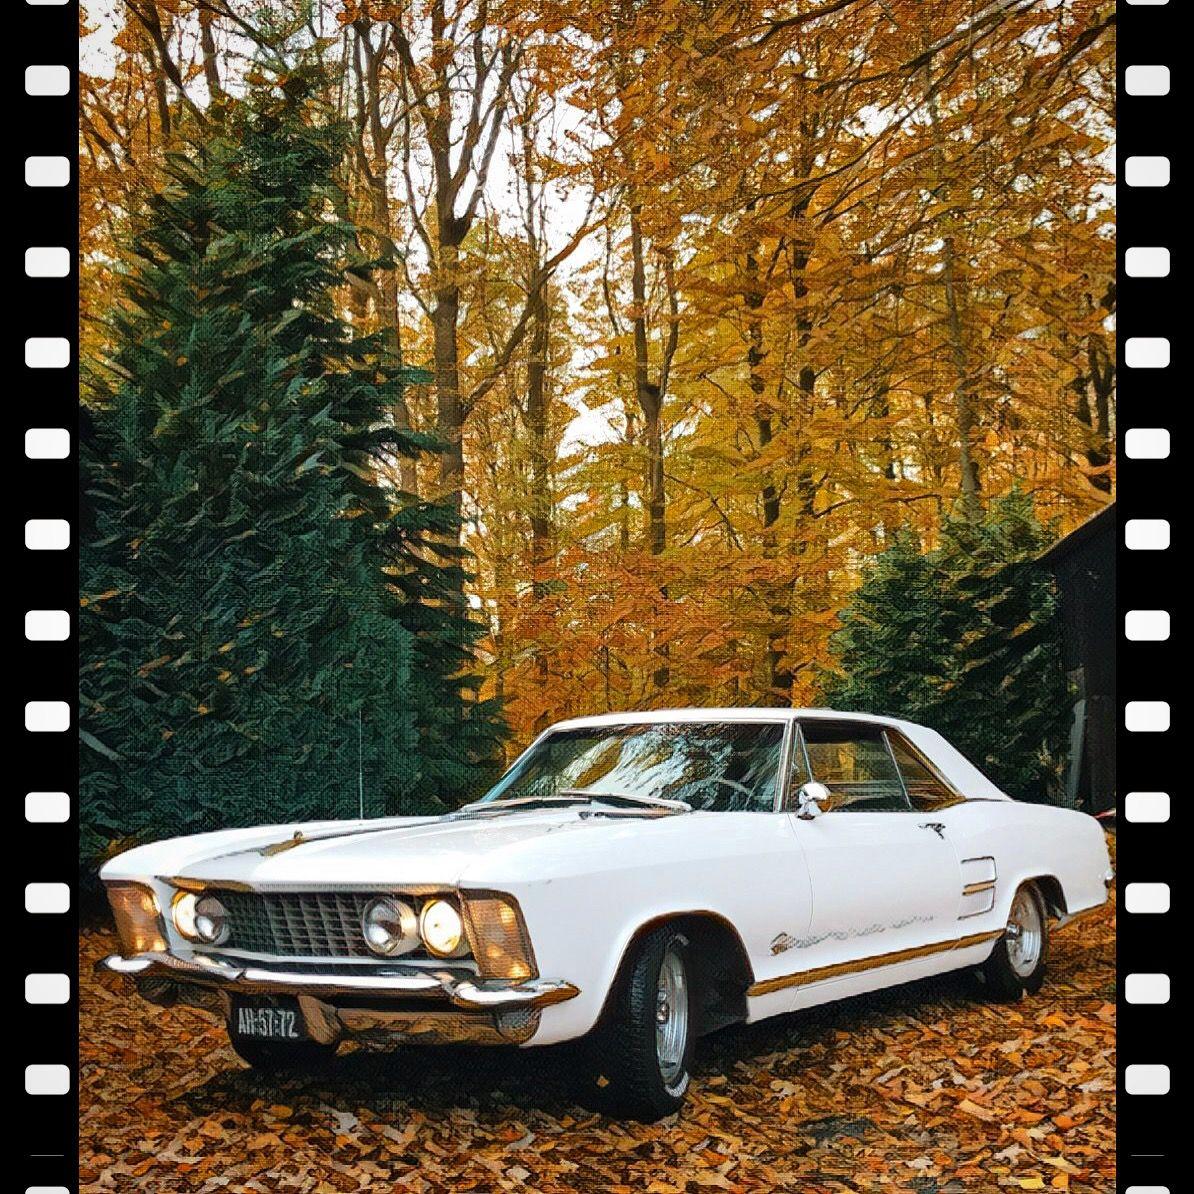 Pin by Yvonne Kolkman on Buick Buick riviera, Old